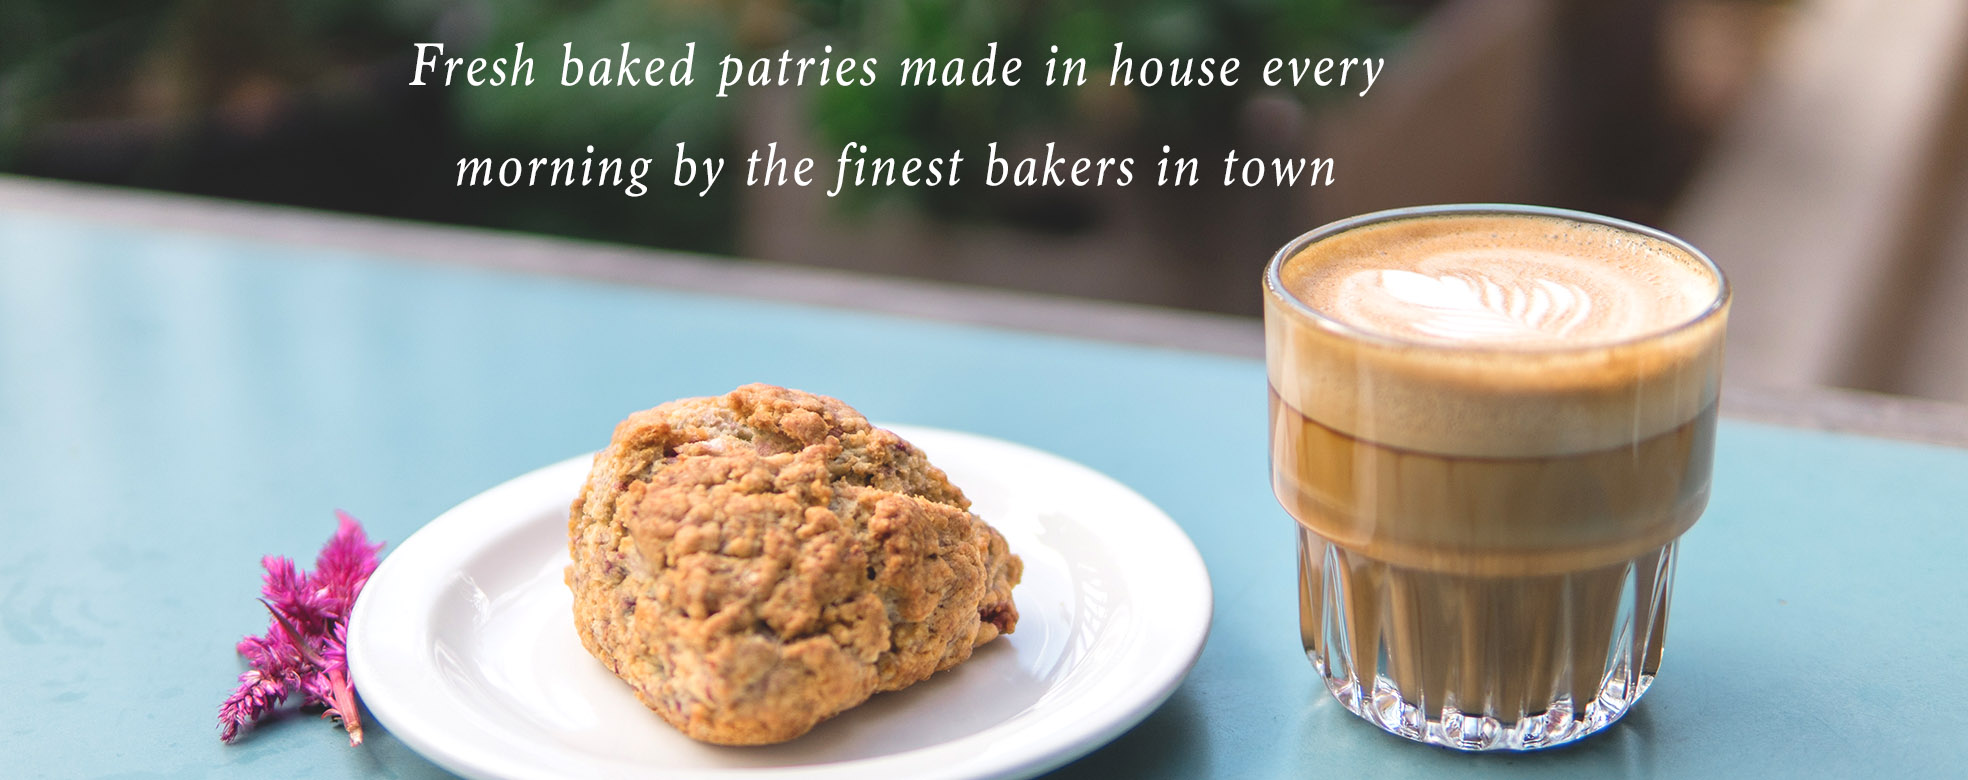 Pannikin La Jolla pastries and coffee